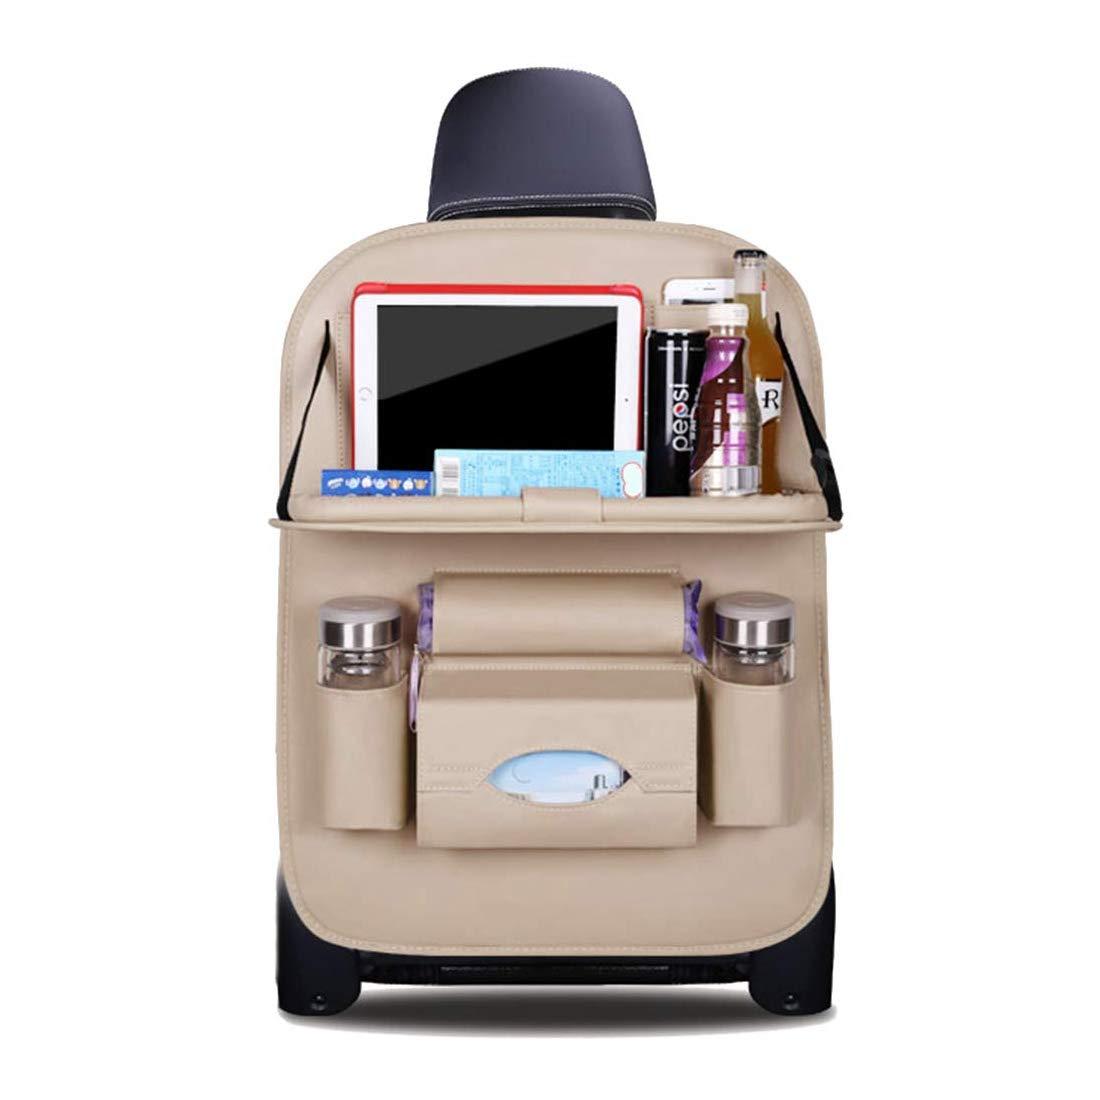 HONCENMAX Car Seat Back Organizer Foldable Dining Table Holder Tray Bottles Holder Multifunctional Protector Storage Bag Kick Mat Travel Accessory PU Leather Black